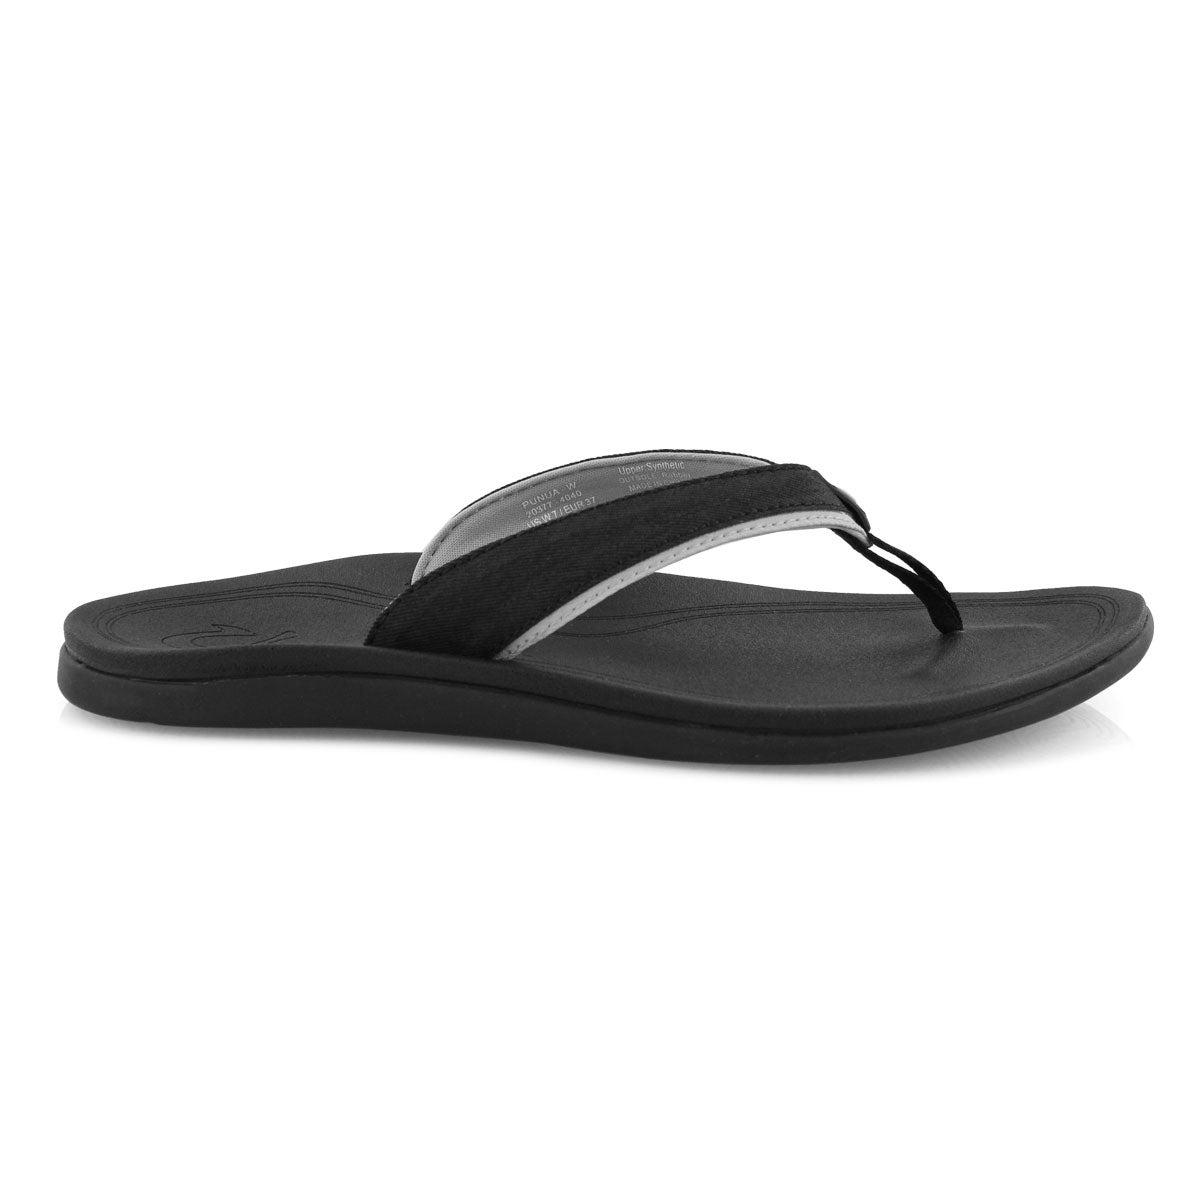 Lds Punua blk/blk thong sandal